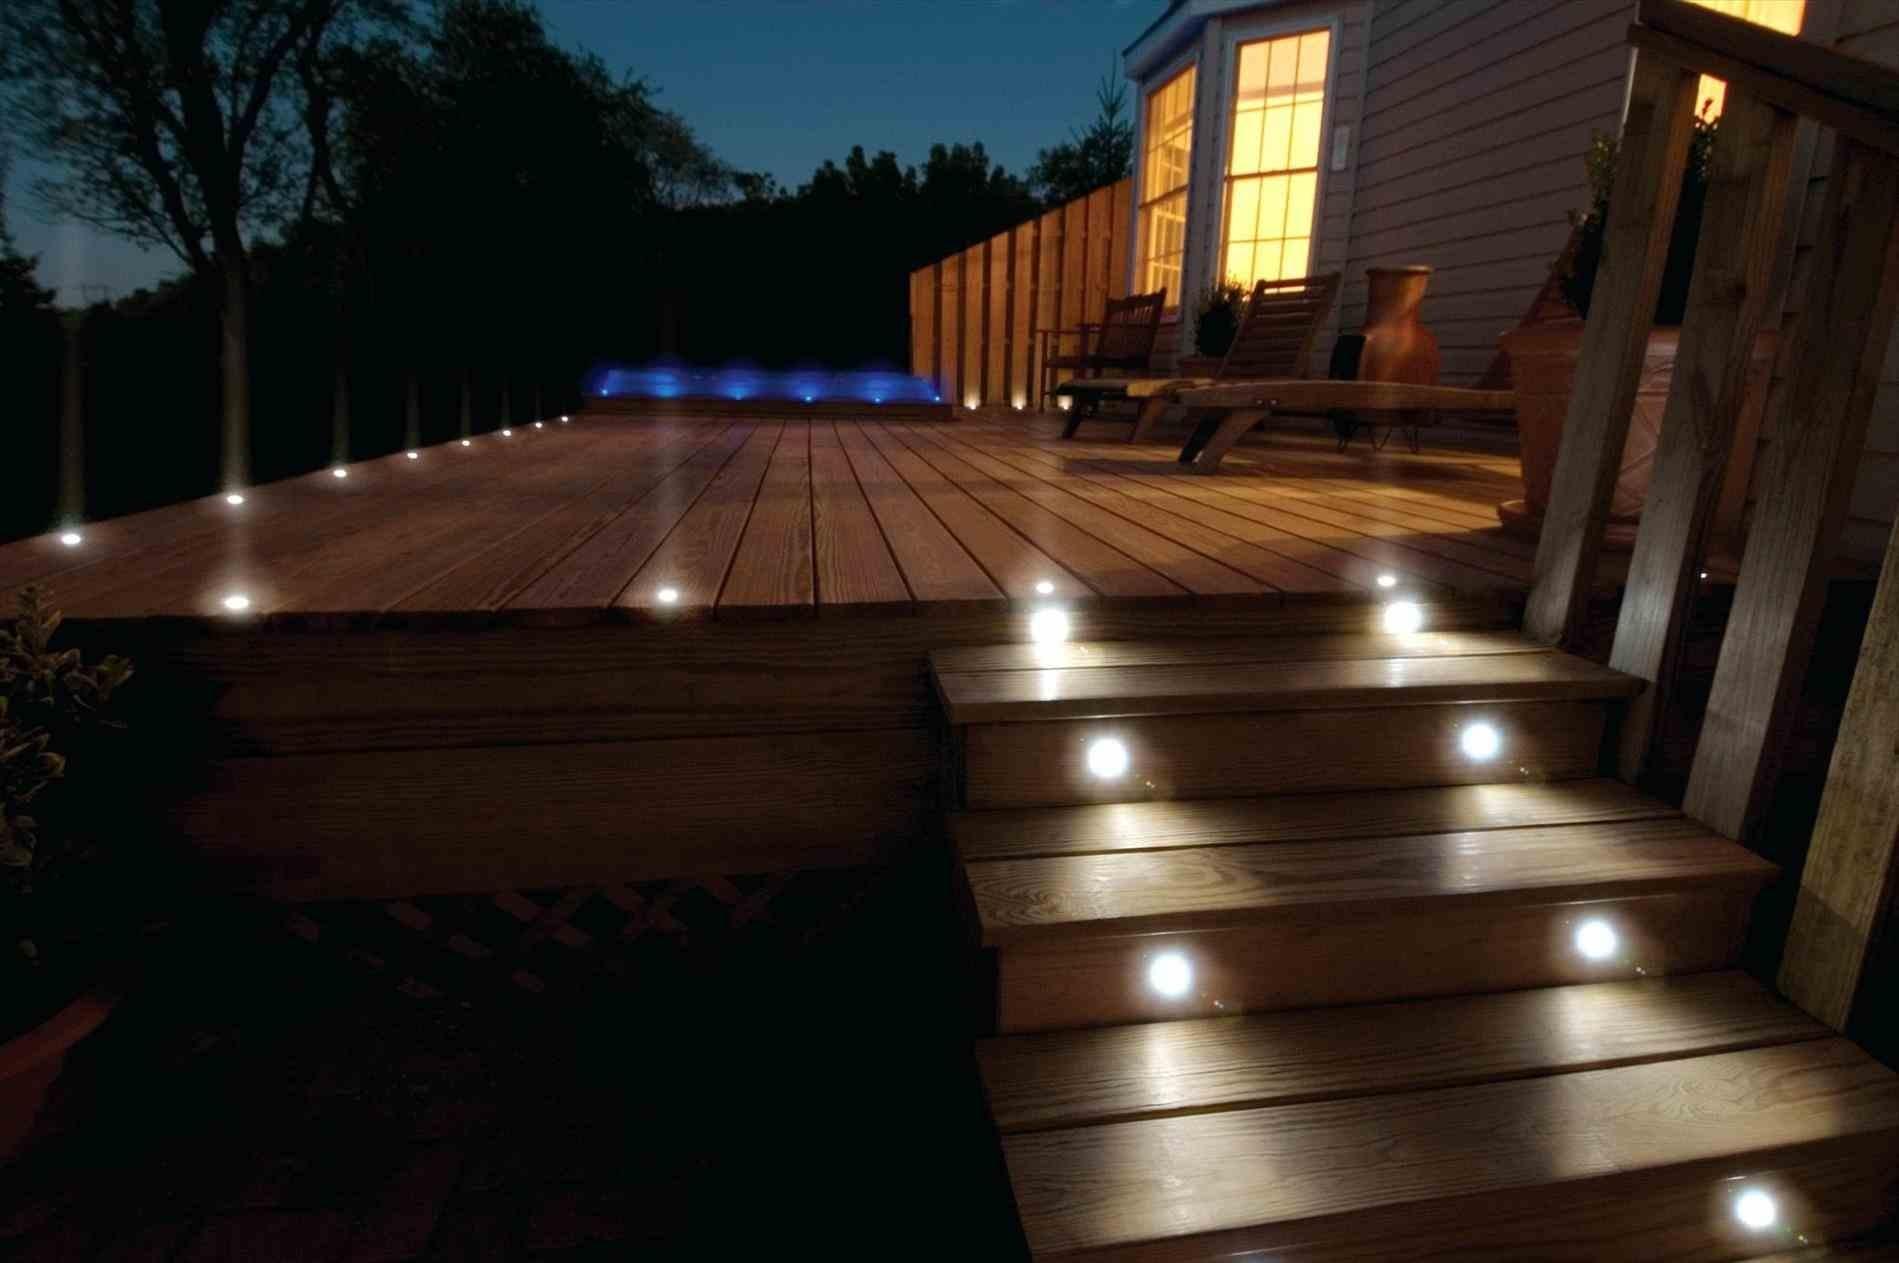 Kits Menards Garden Ideas Patio Deck Some Tips To Get The Best For Garden Low Voltage Deck Lighting (#7 of 15)